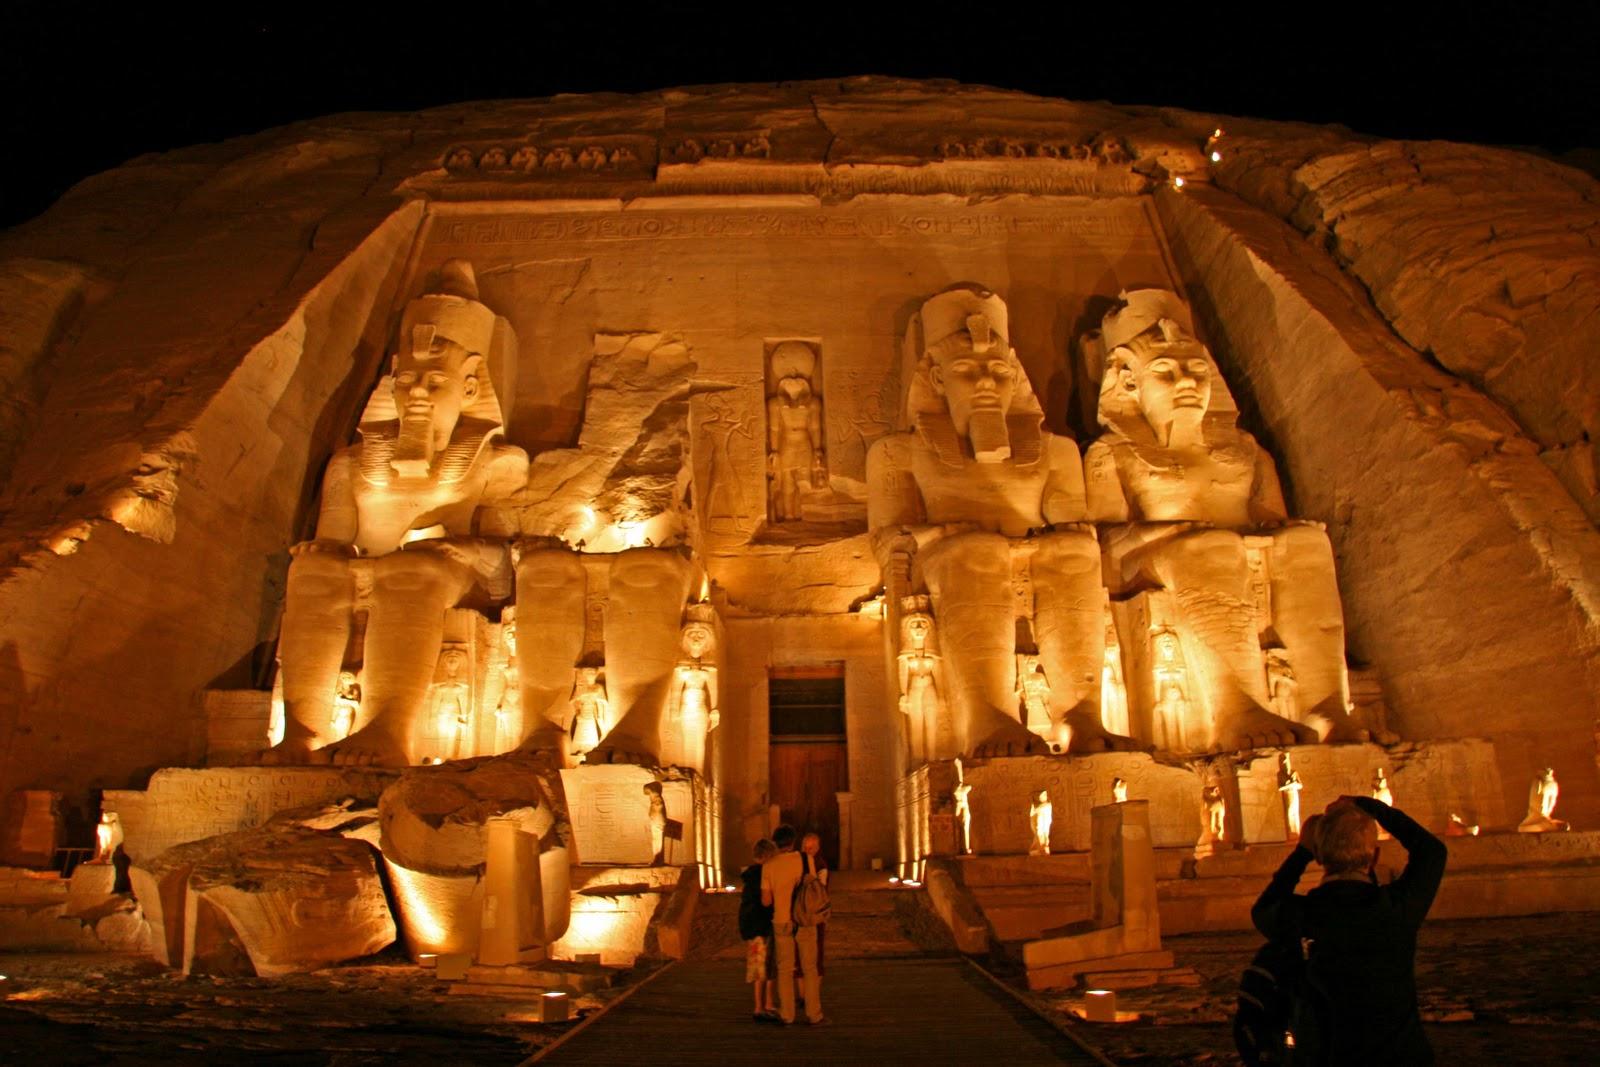 egyptian pyramids pyramid wallpapers pyramid pictures egypt pyramid 1600x1067